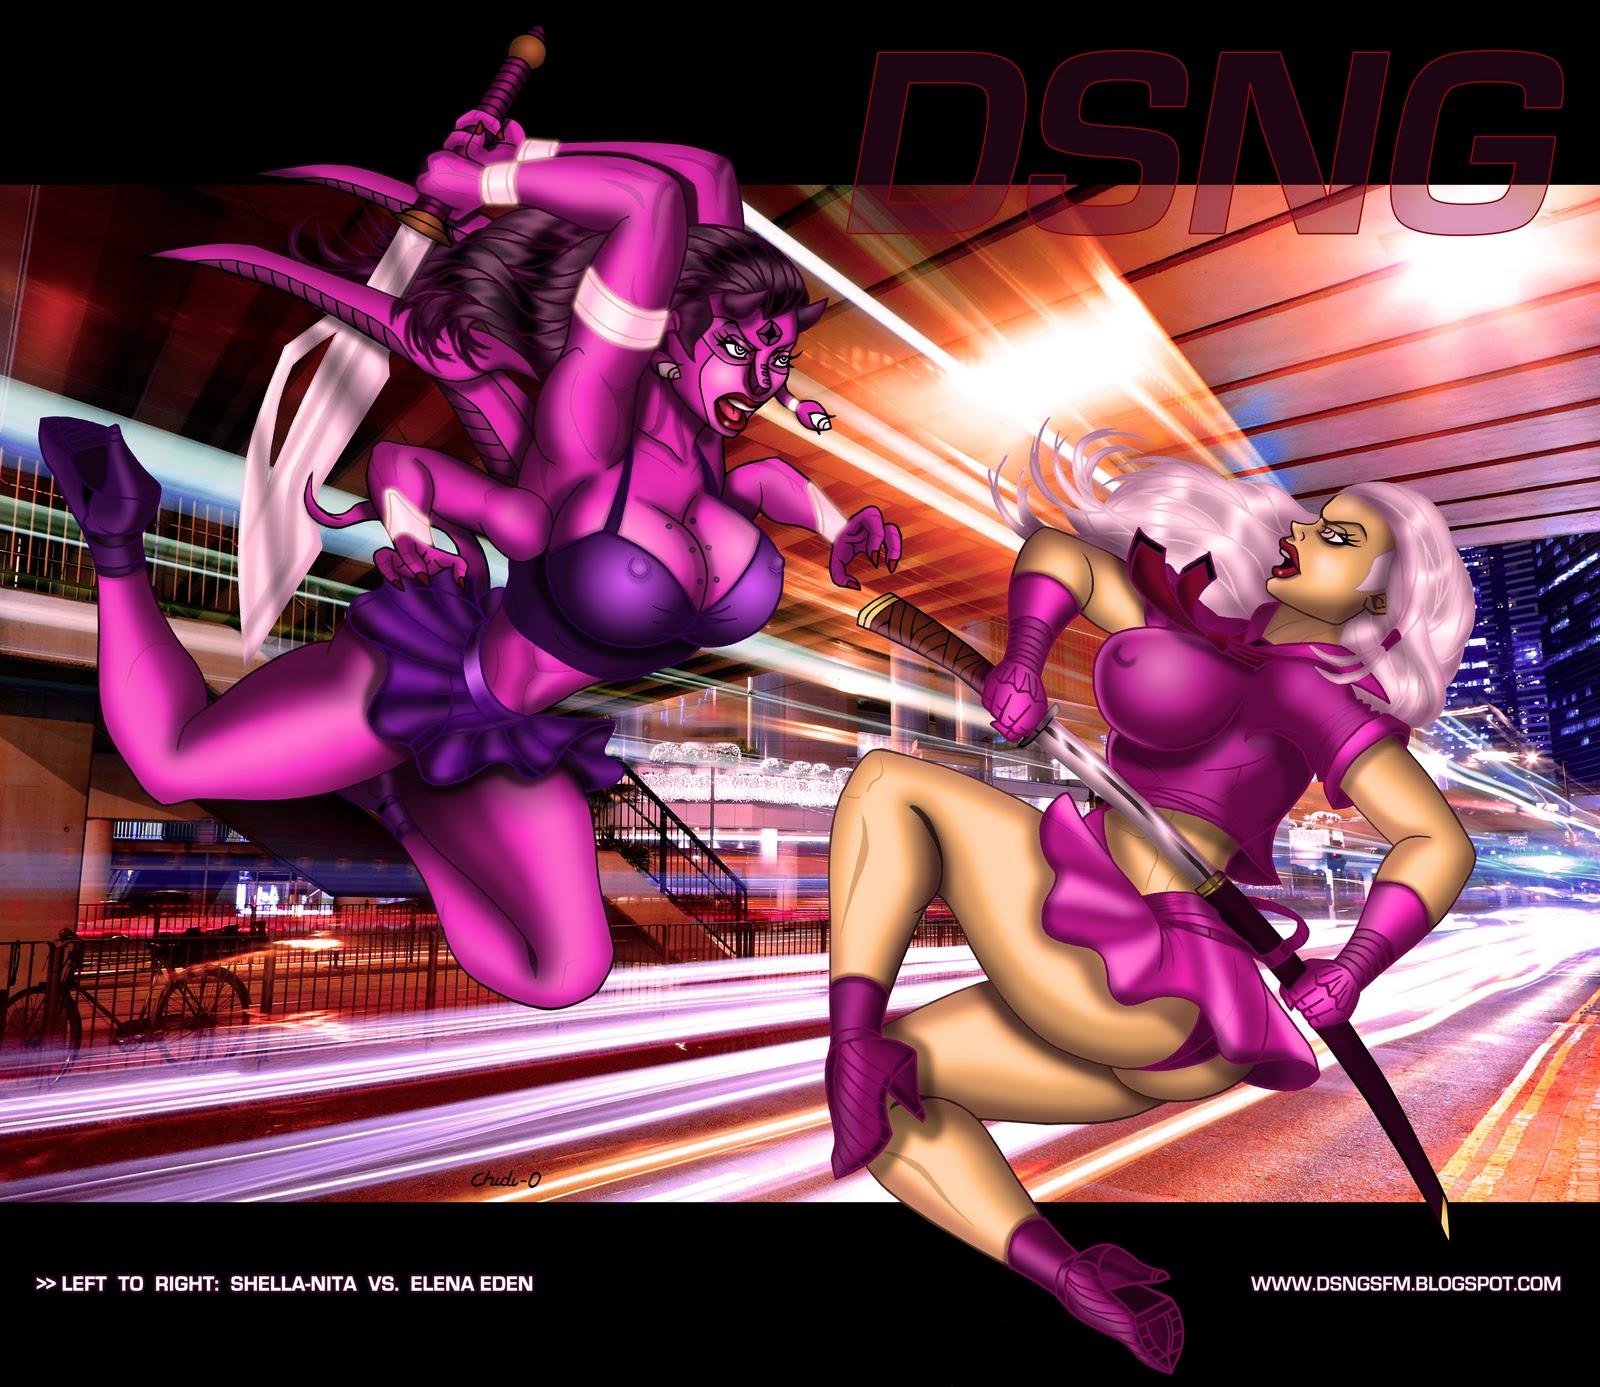 Erotic comics sci fi